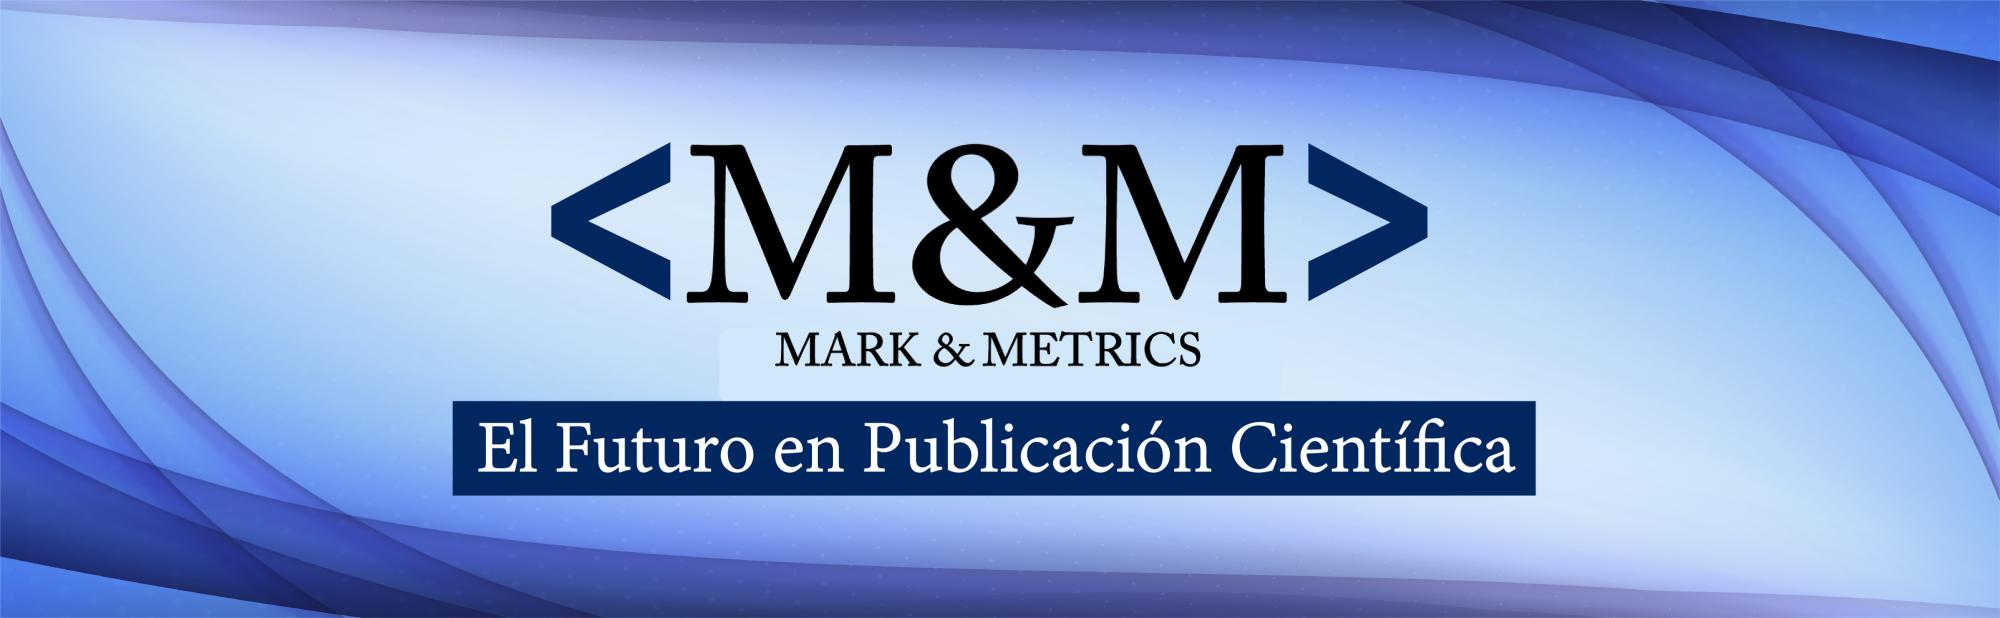 Mark and Metrics